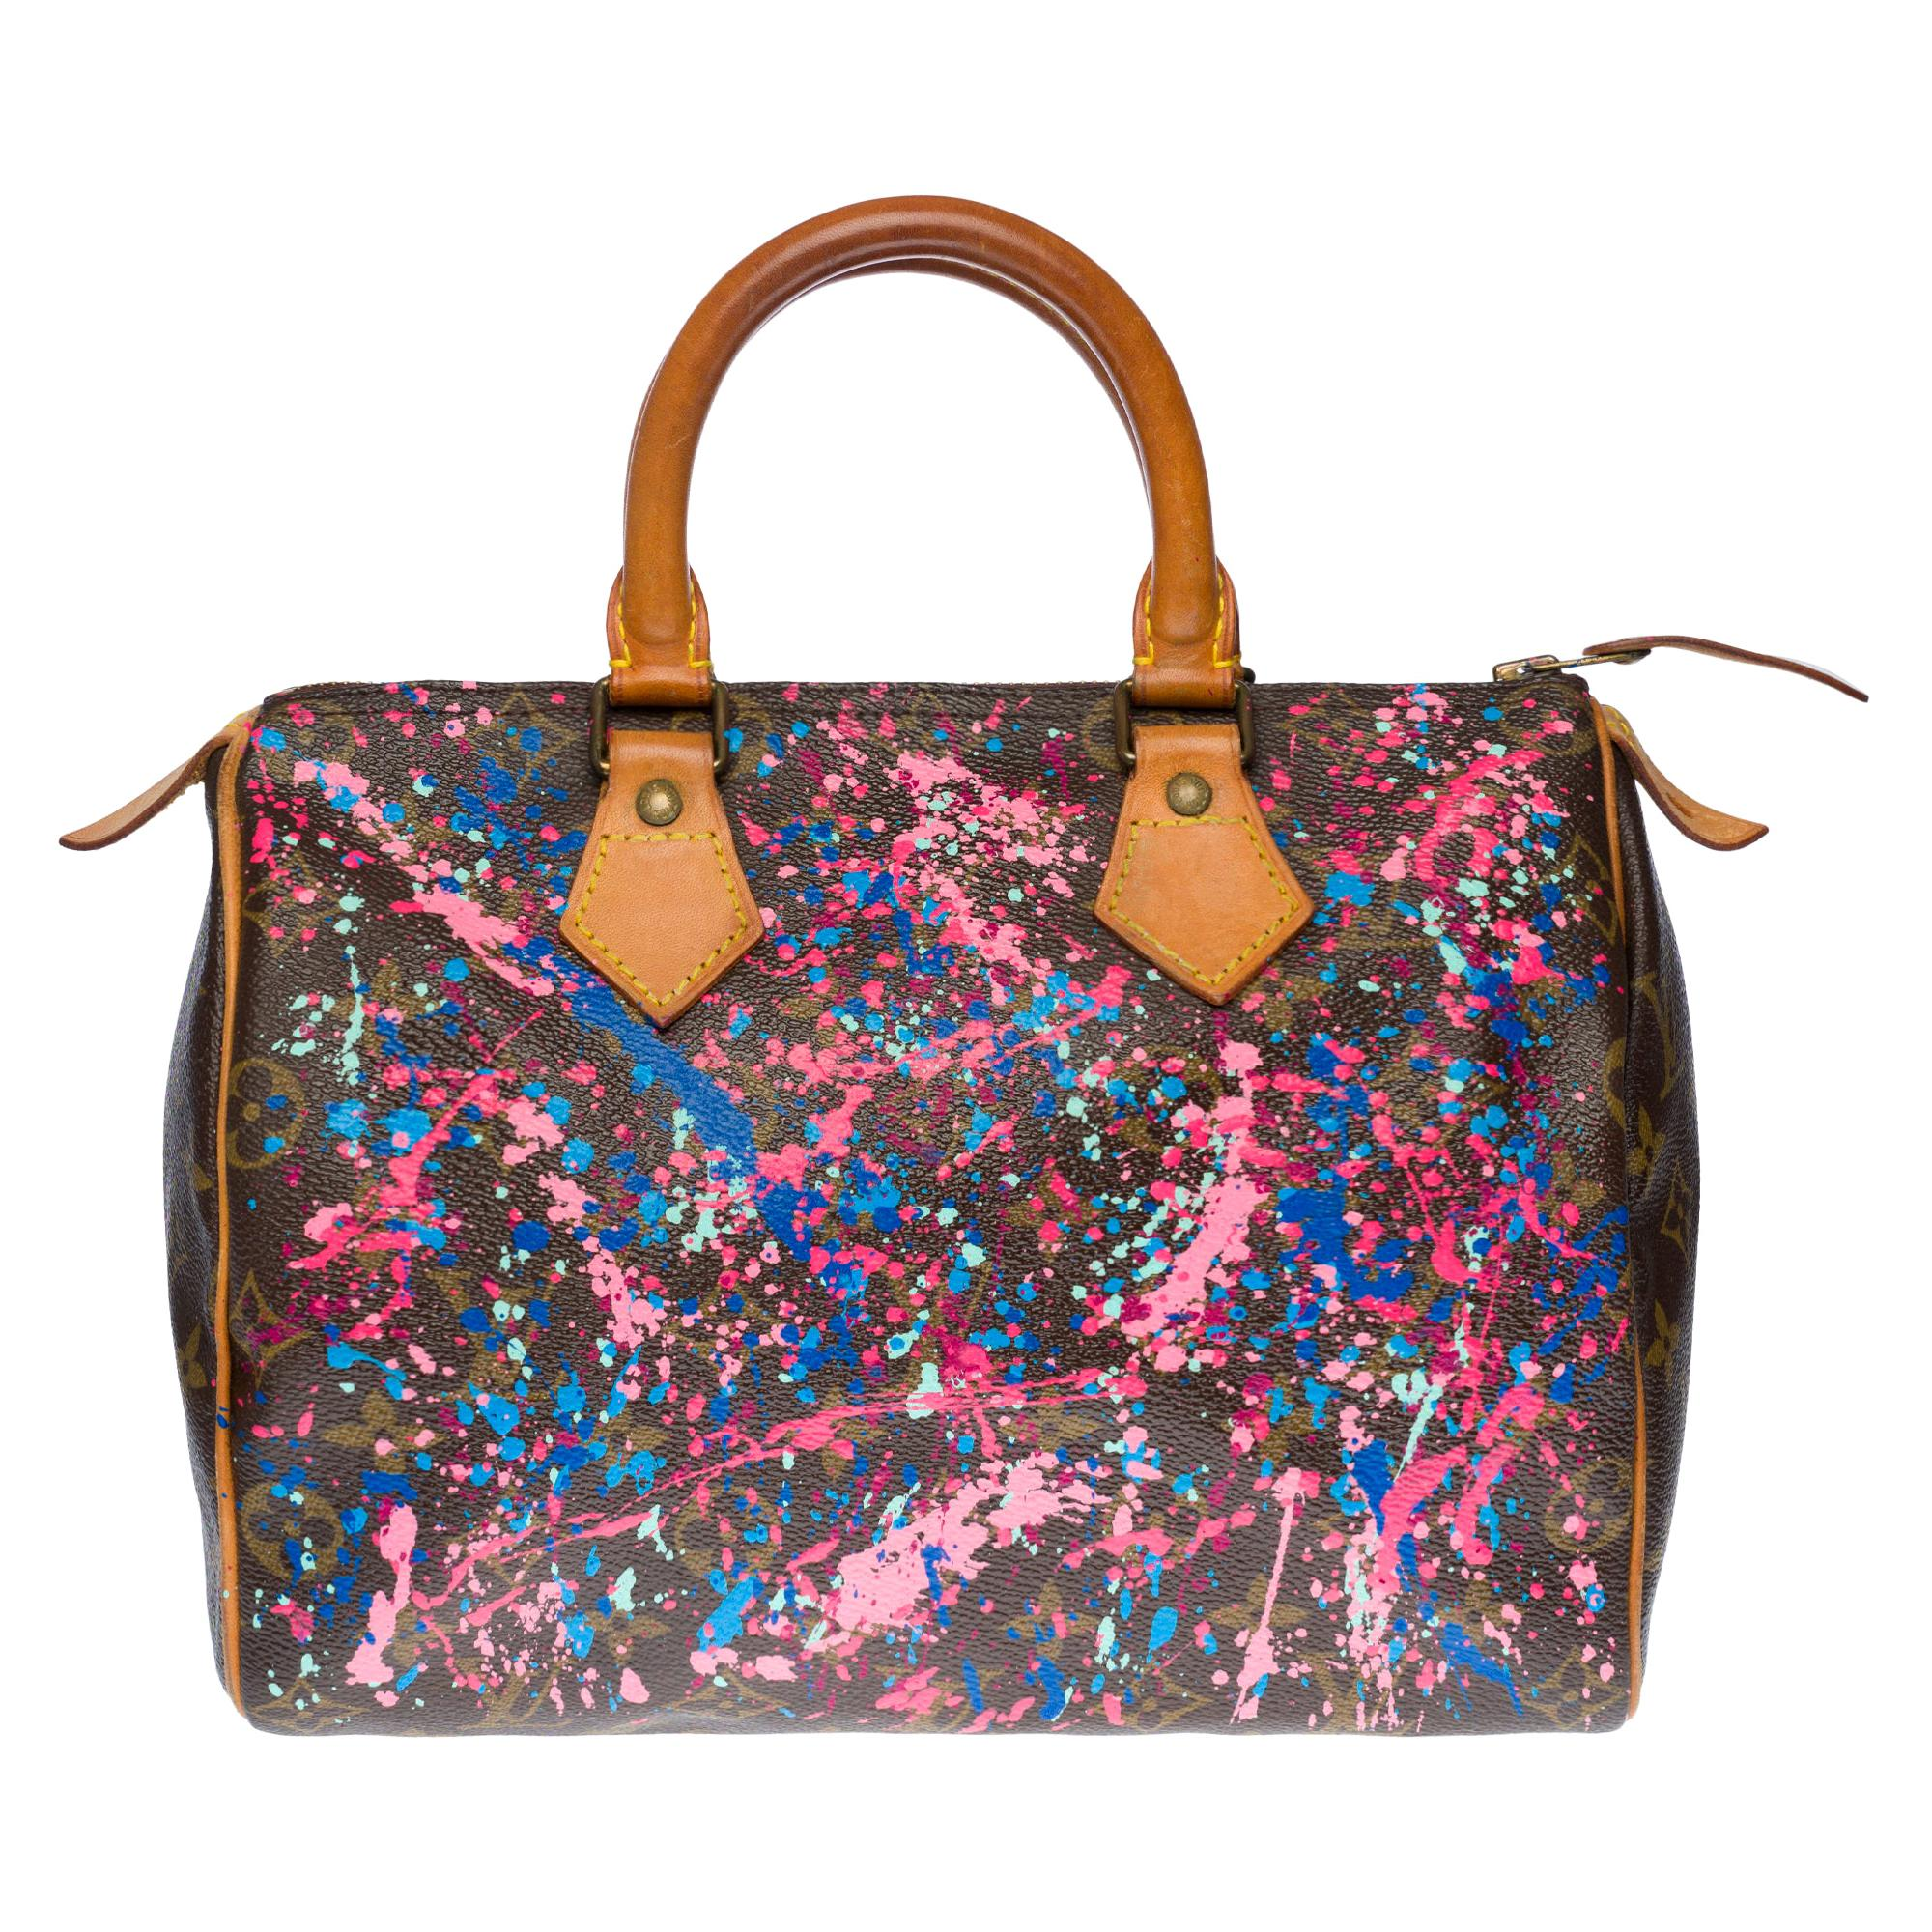 "Customized Louis Vuitton Speedy 25 ""Rainbow"" handbag in Monogram canvas"